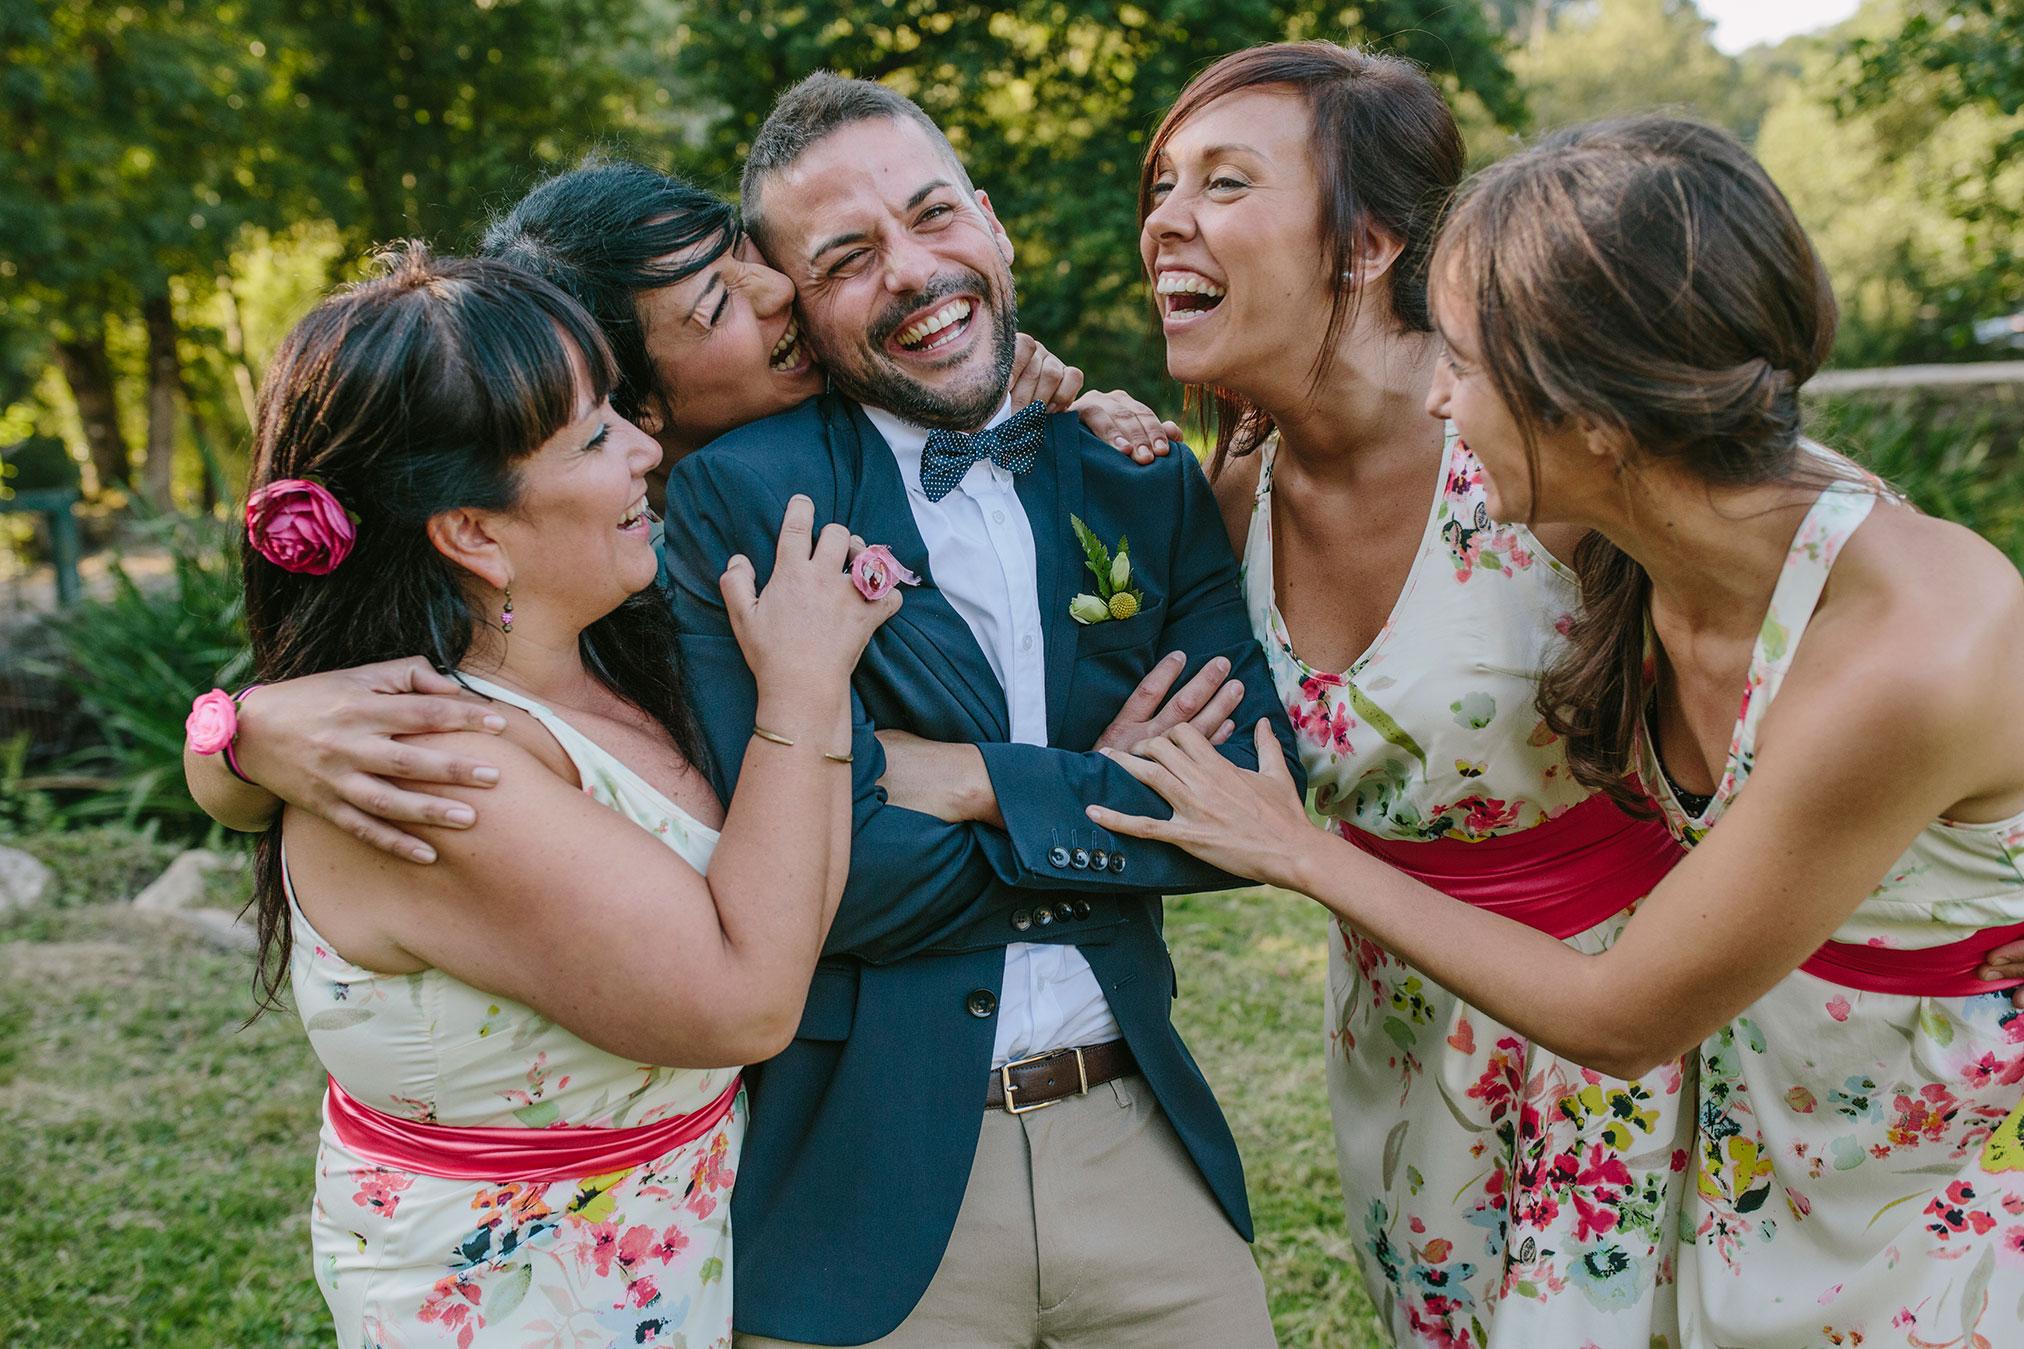 Wedding Photographer Graciela Vilagudin Dublin Galicia 837.jpg